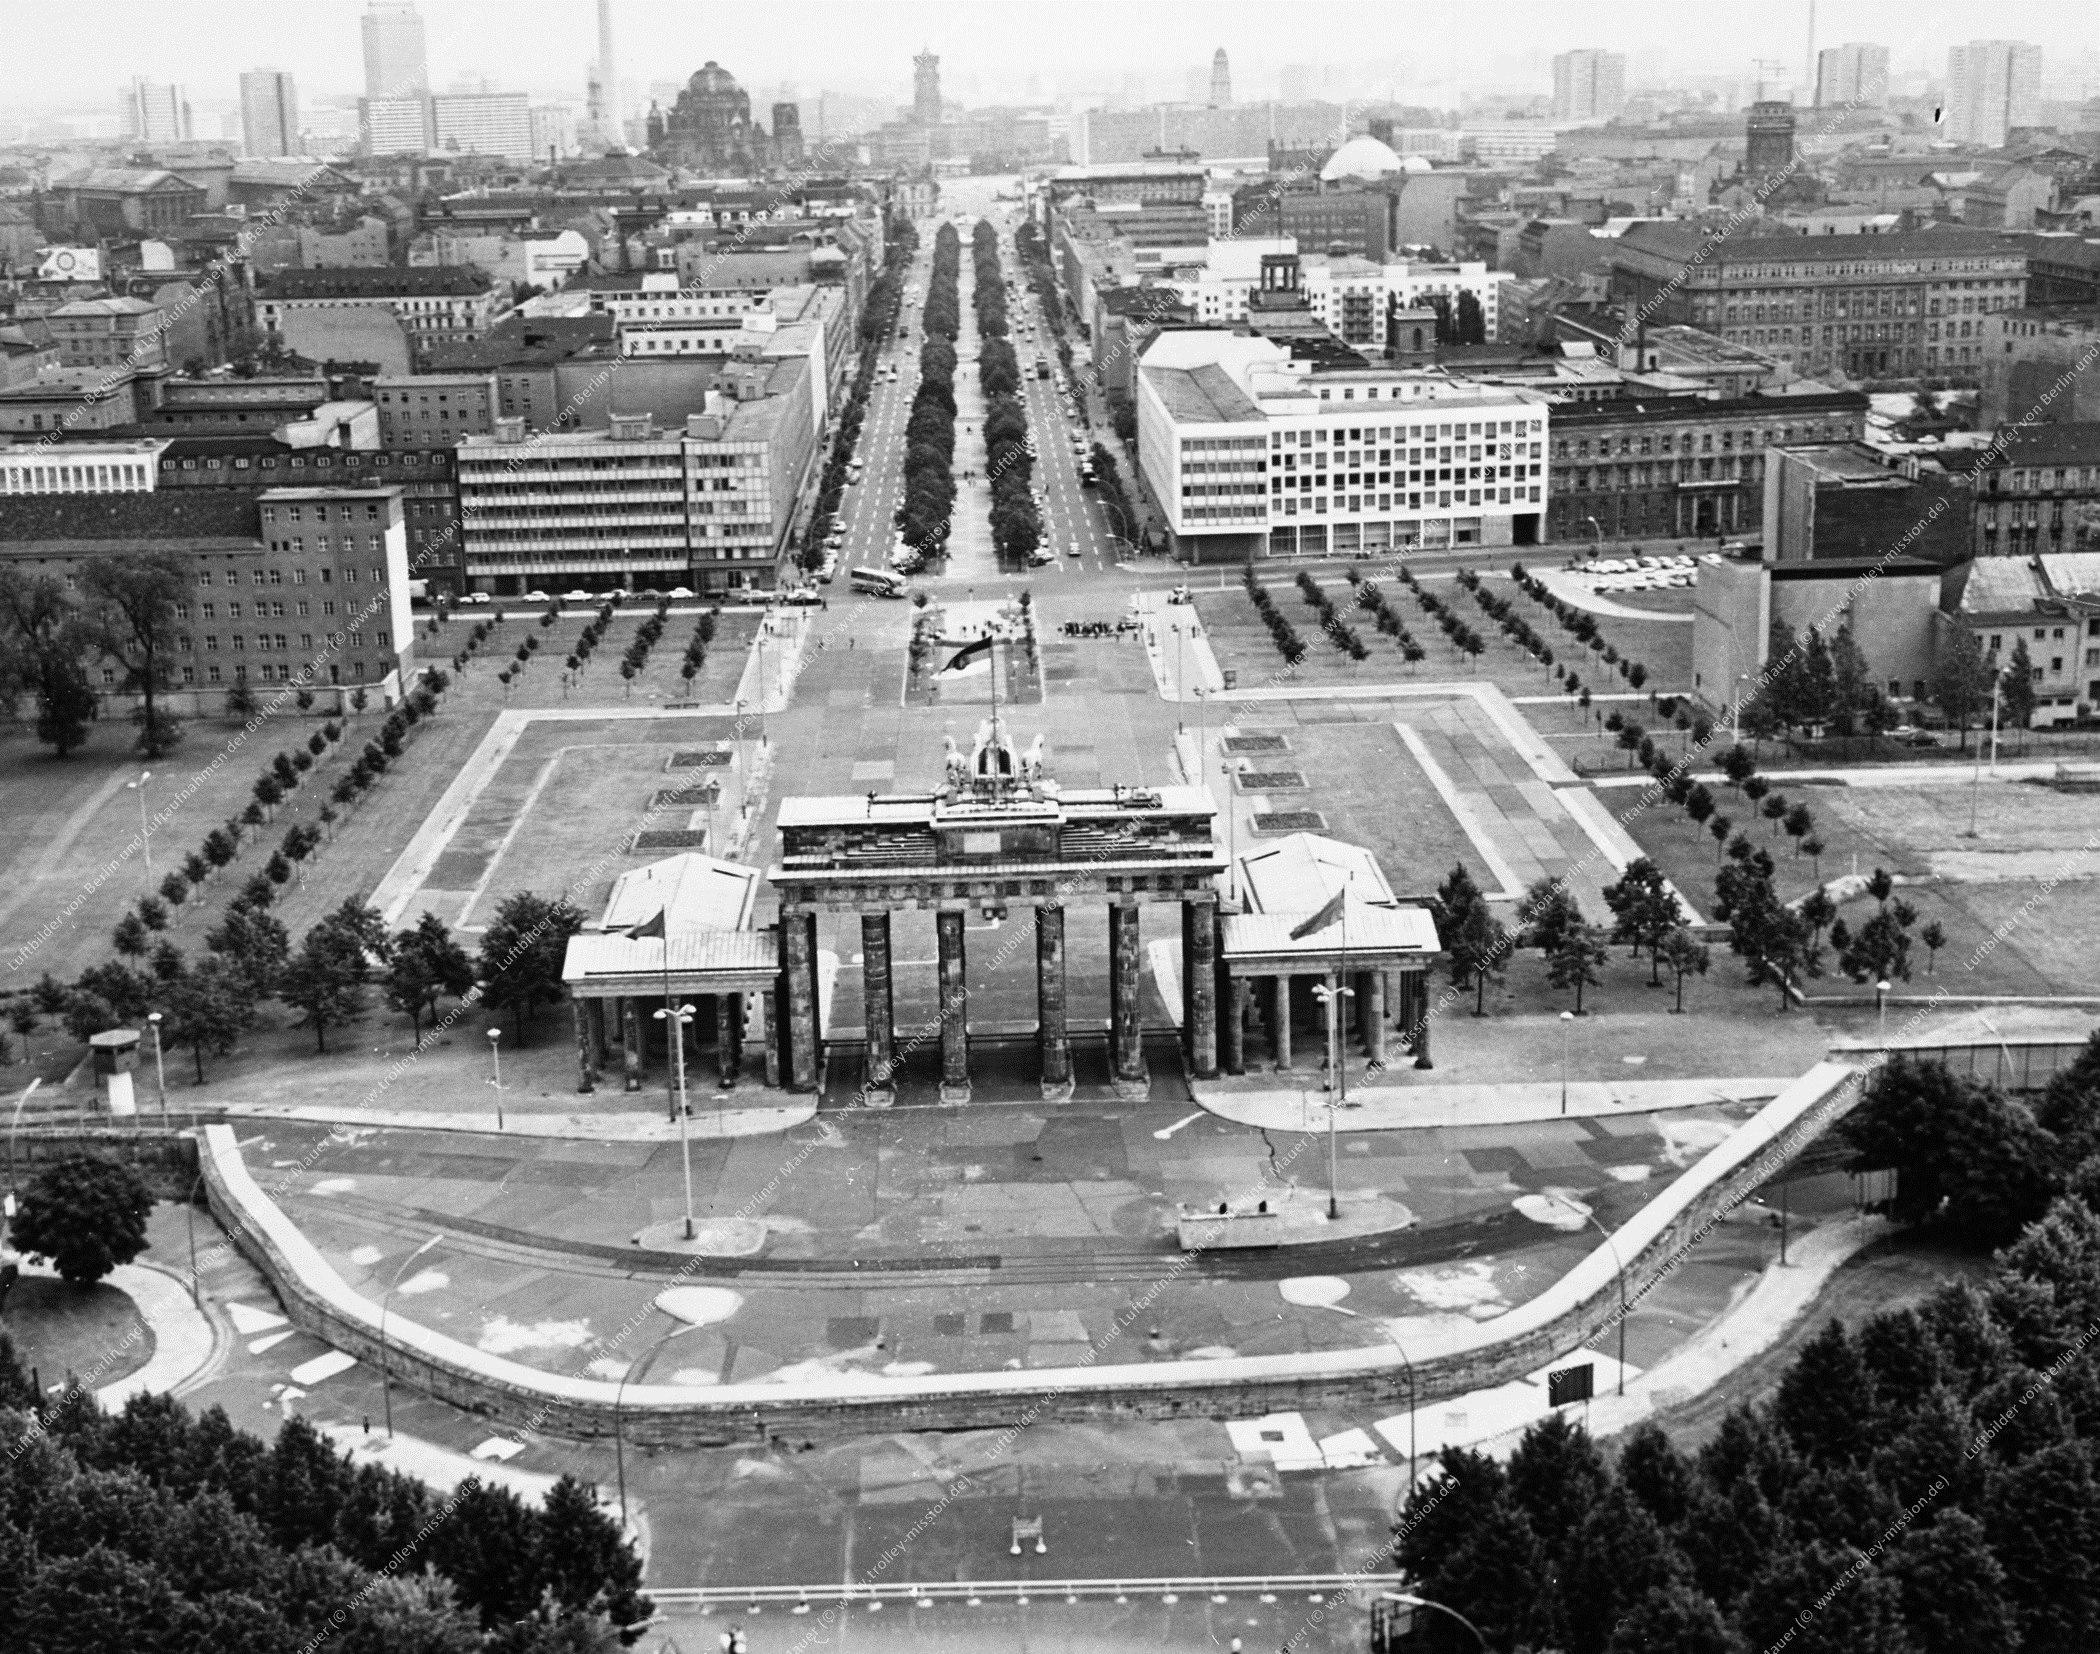 Berlin Luftbild Brandenburger Tor (Bild 039)